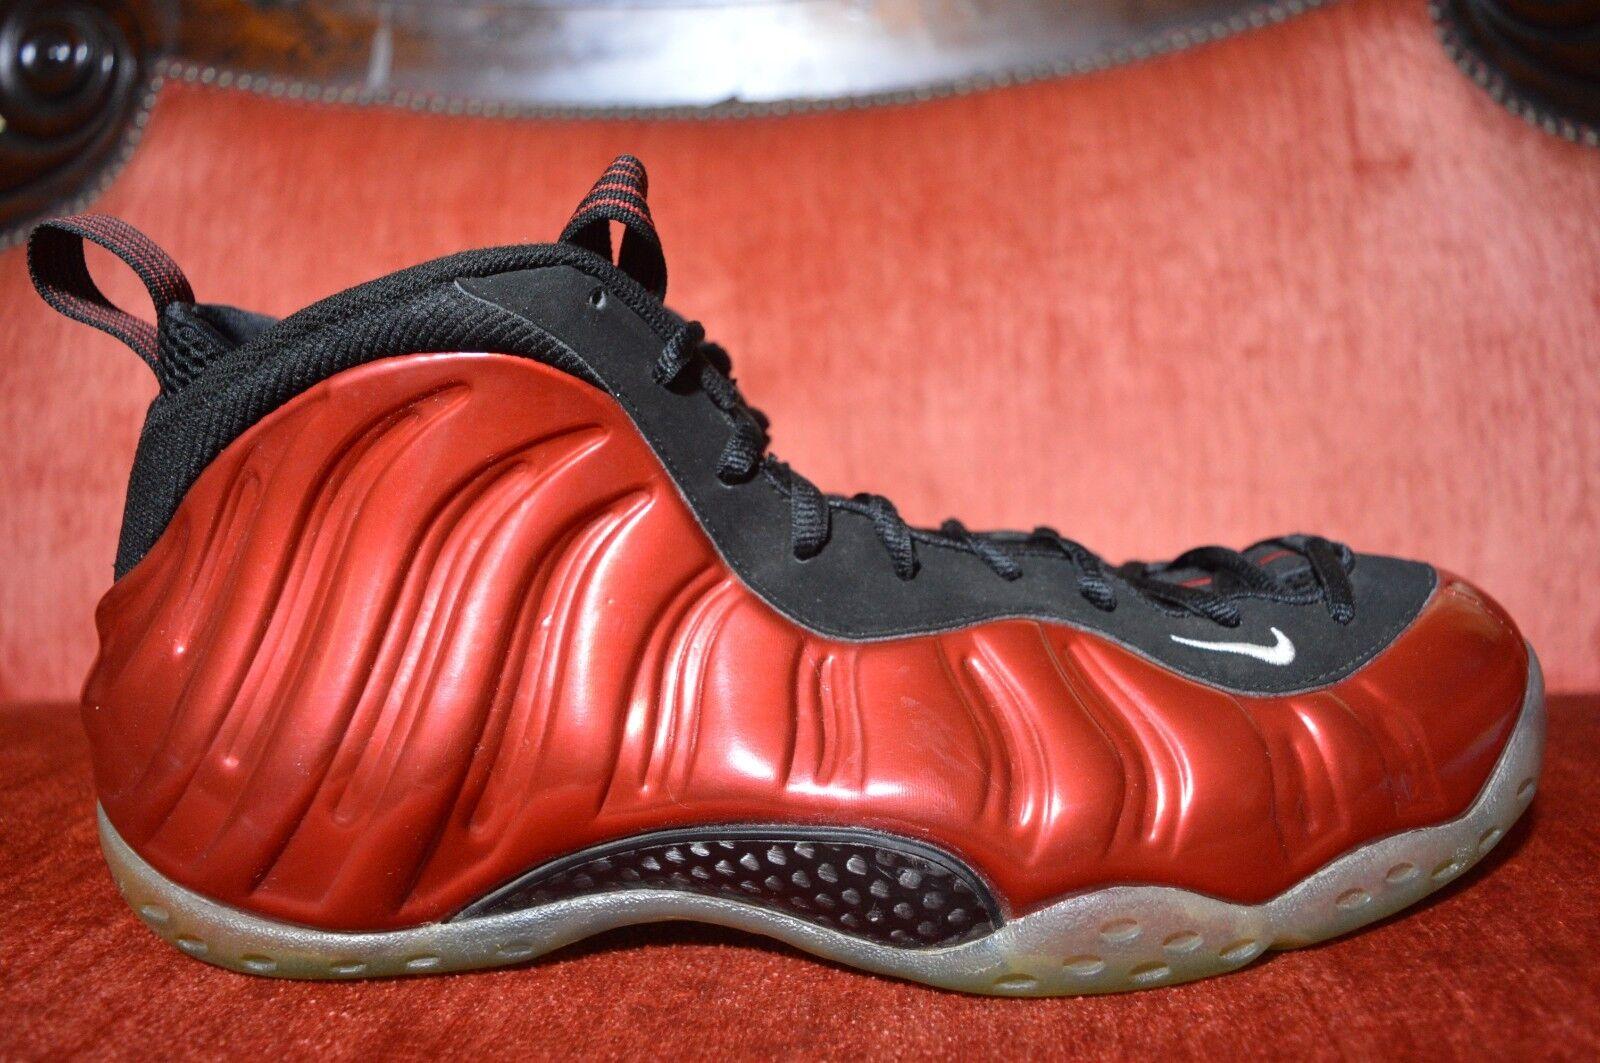 Nike Air Foamposites One Metallic Red Size 14 Varsity Red Black White 314996-610